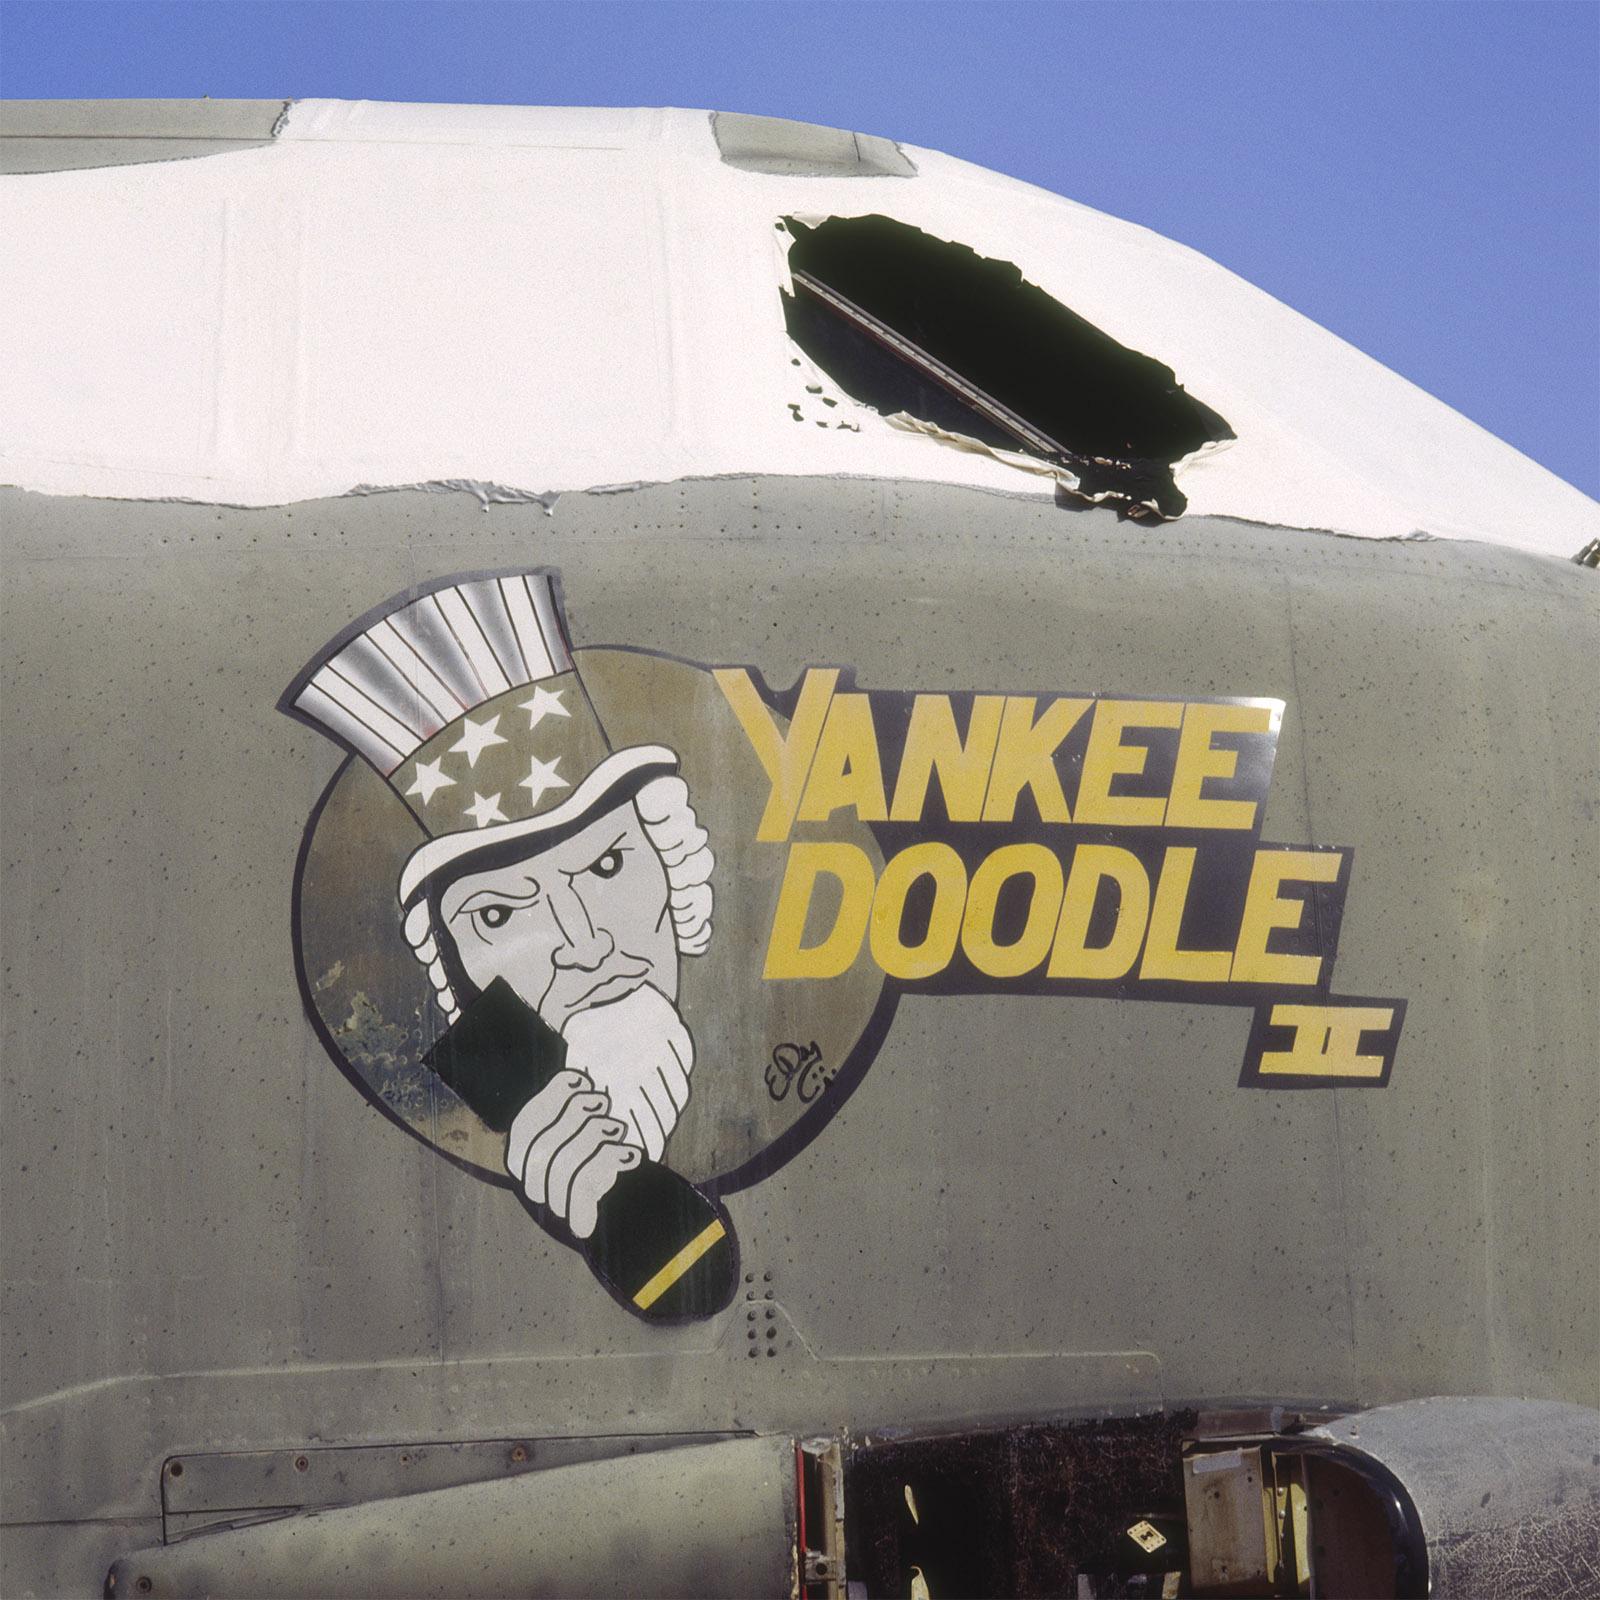 yankee doodle nose art - rev.jpg